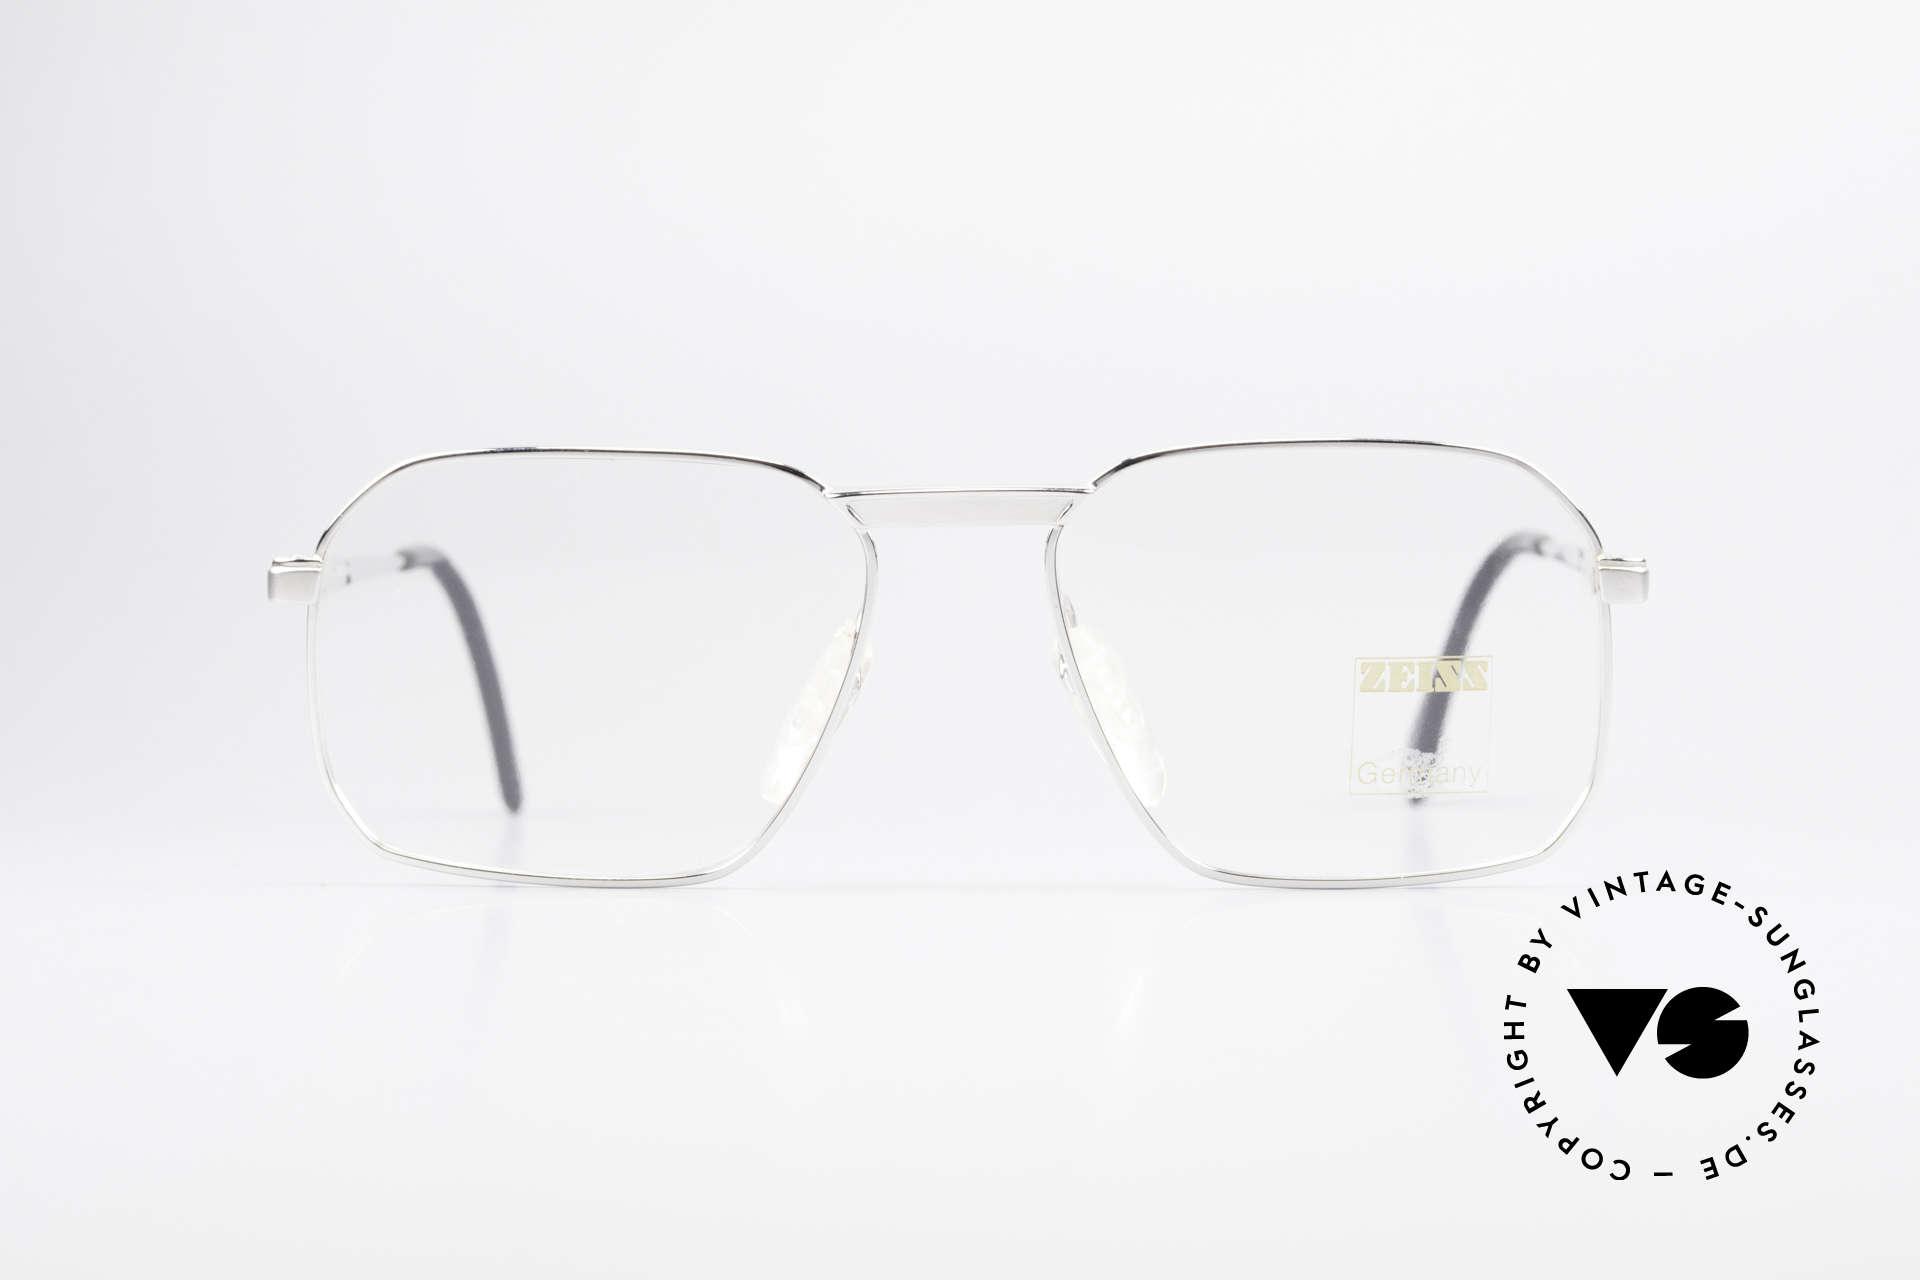 Zeiss 5922 Rare Old 90's Eyeglasses Men, outstanding craftsmanship - frame 'made in Germany', Made for Men